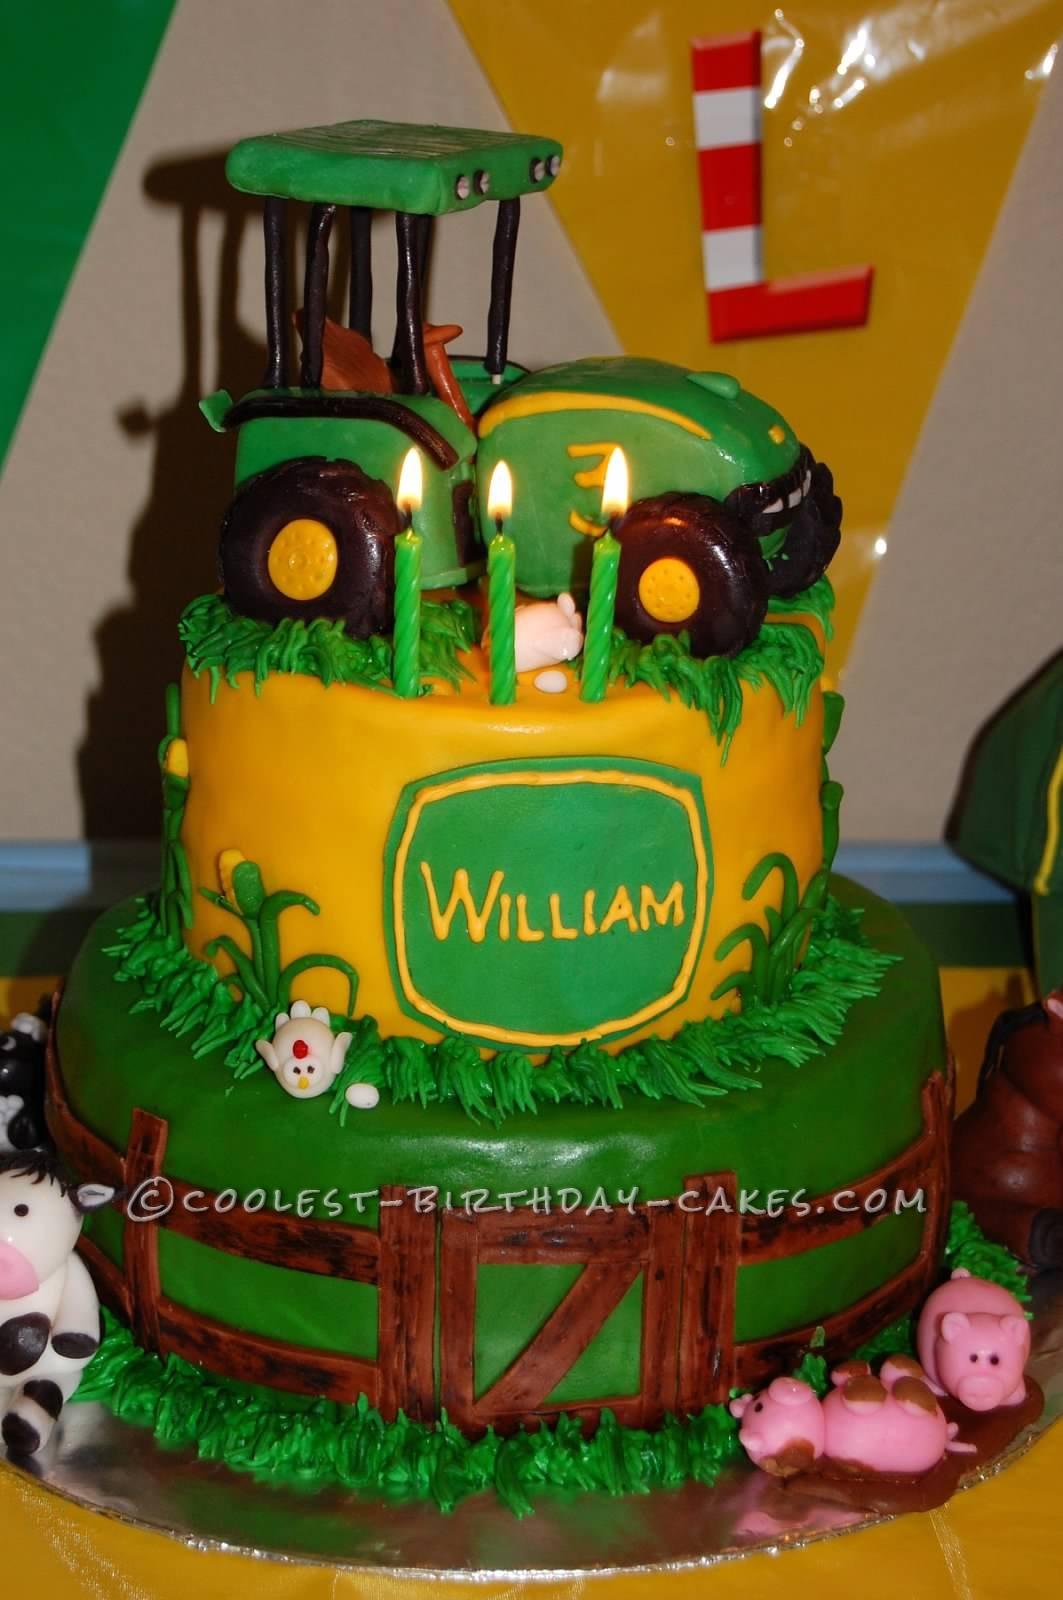 Coolest Farming Scene Birthday Cake